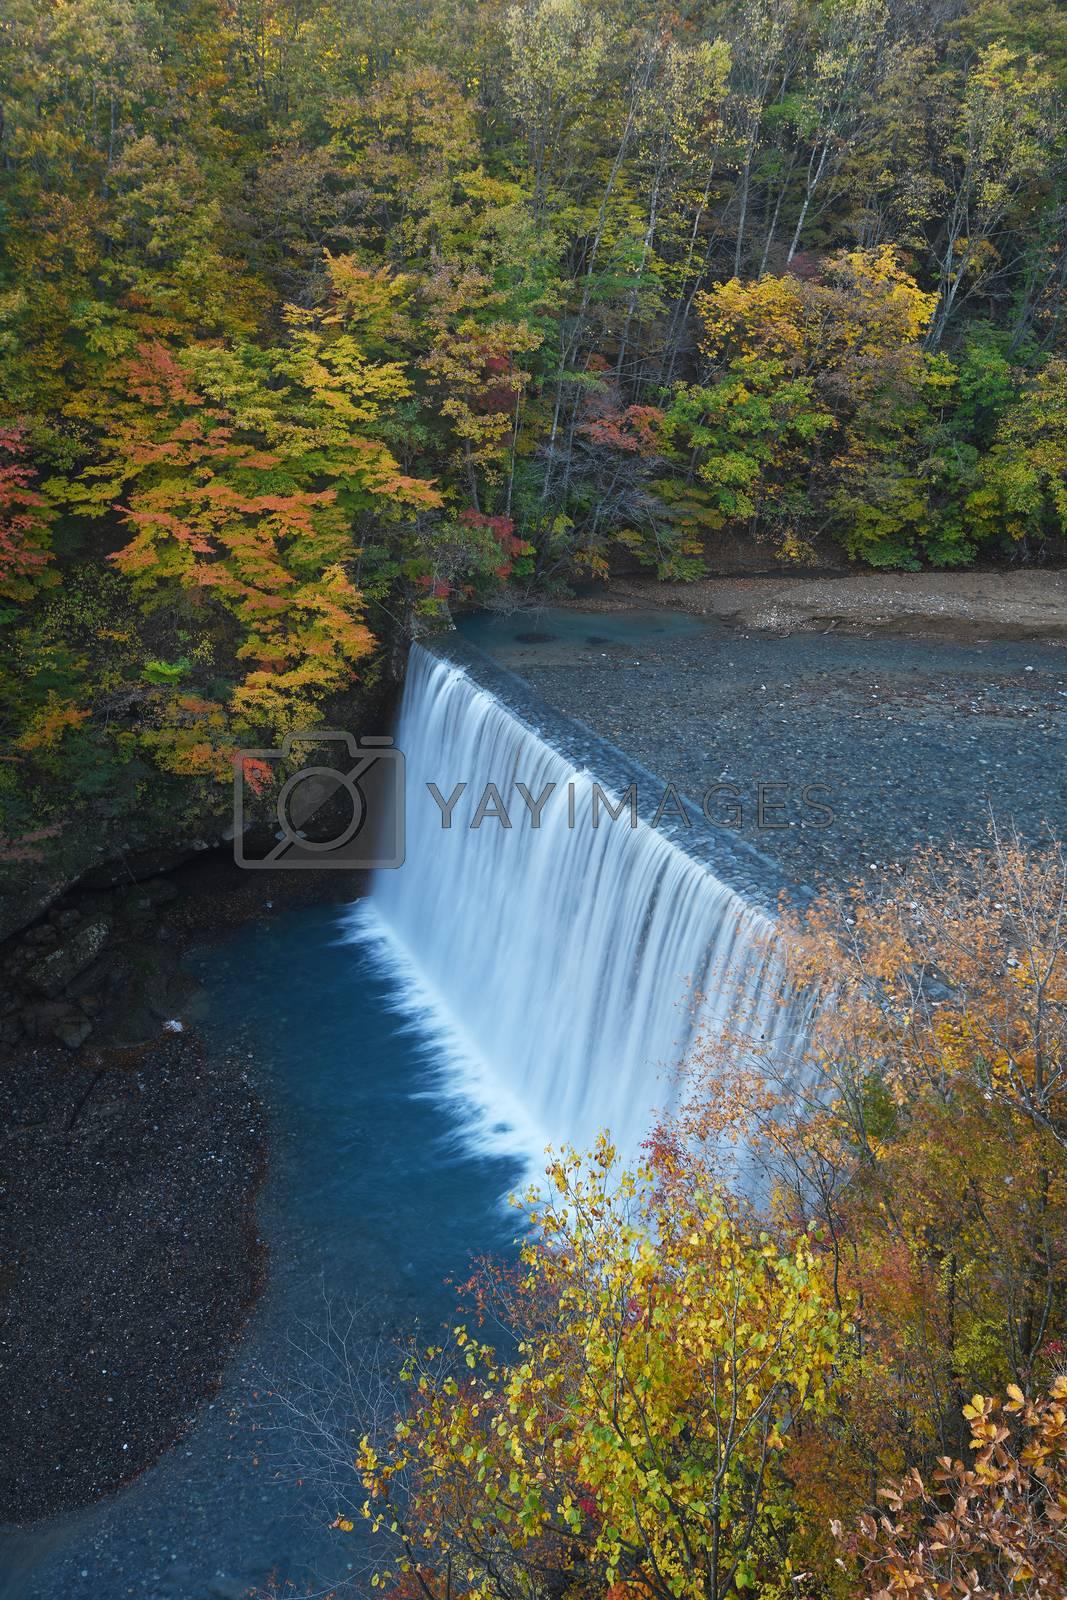 Royalty free image of Autumn scene with a dam near Tohoku, Japan by porbital